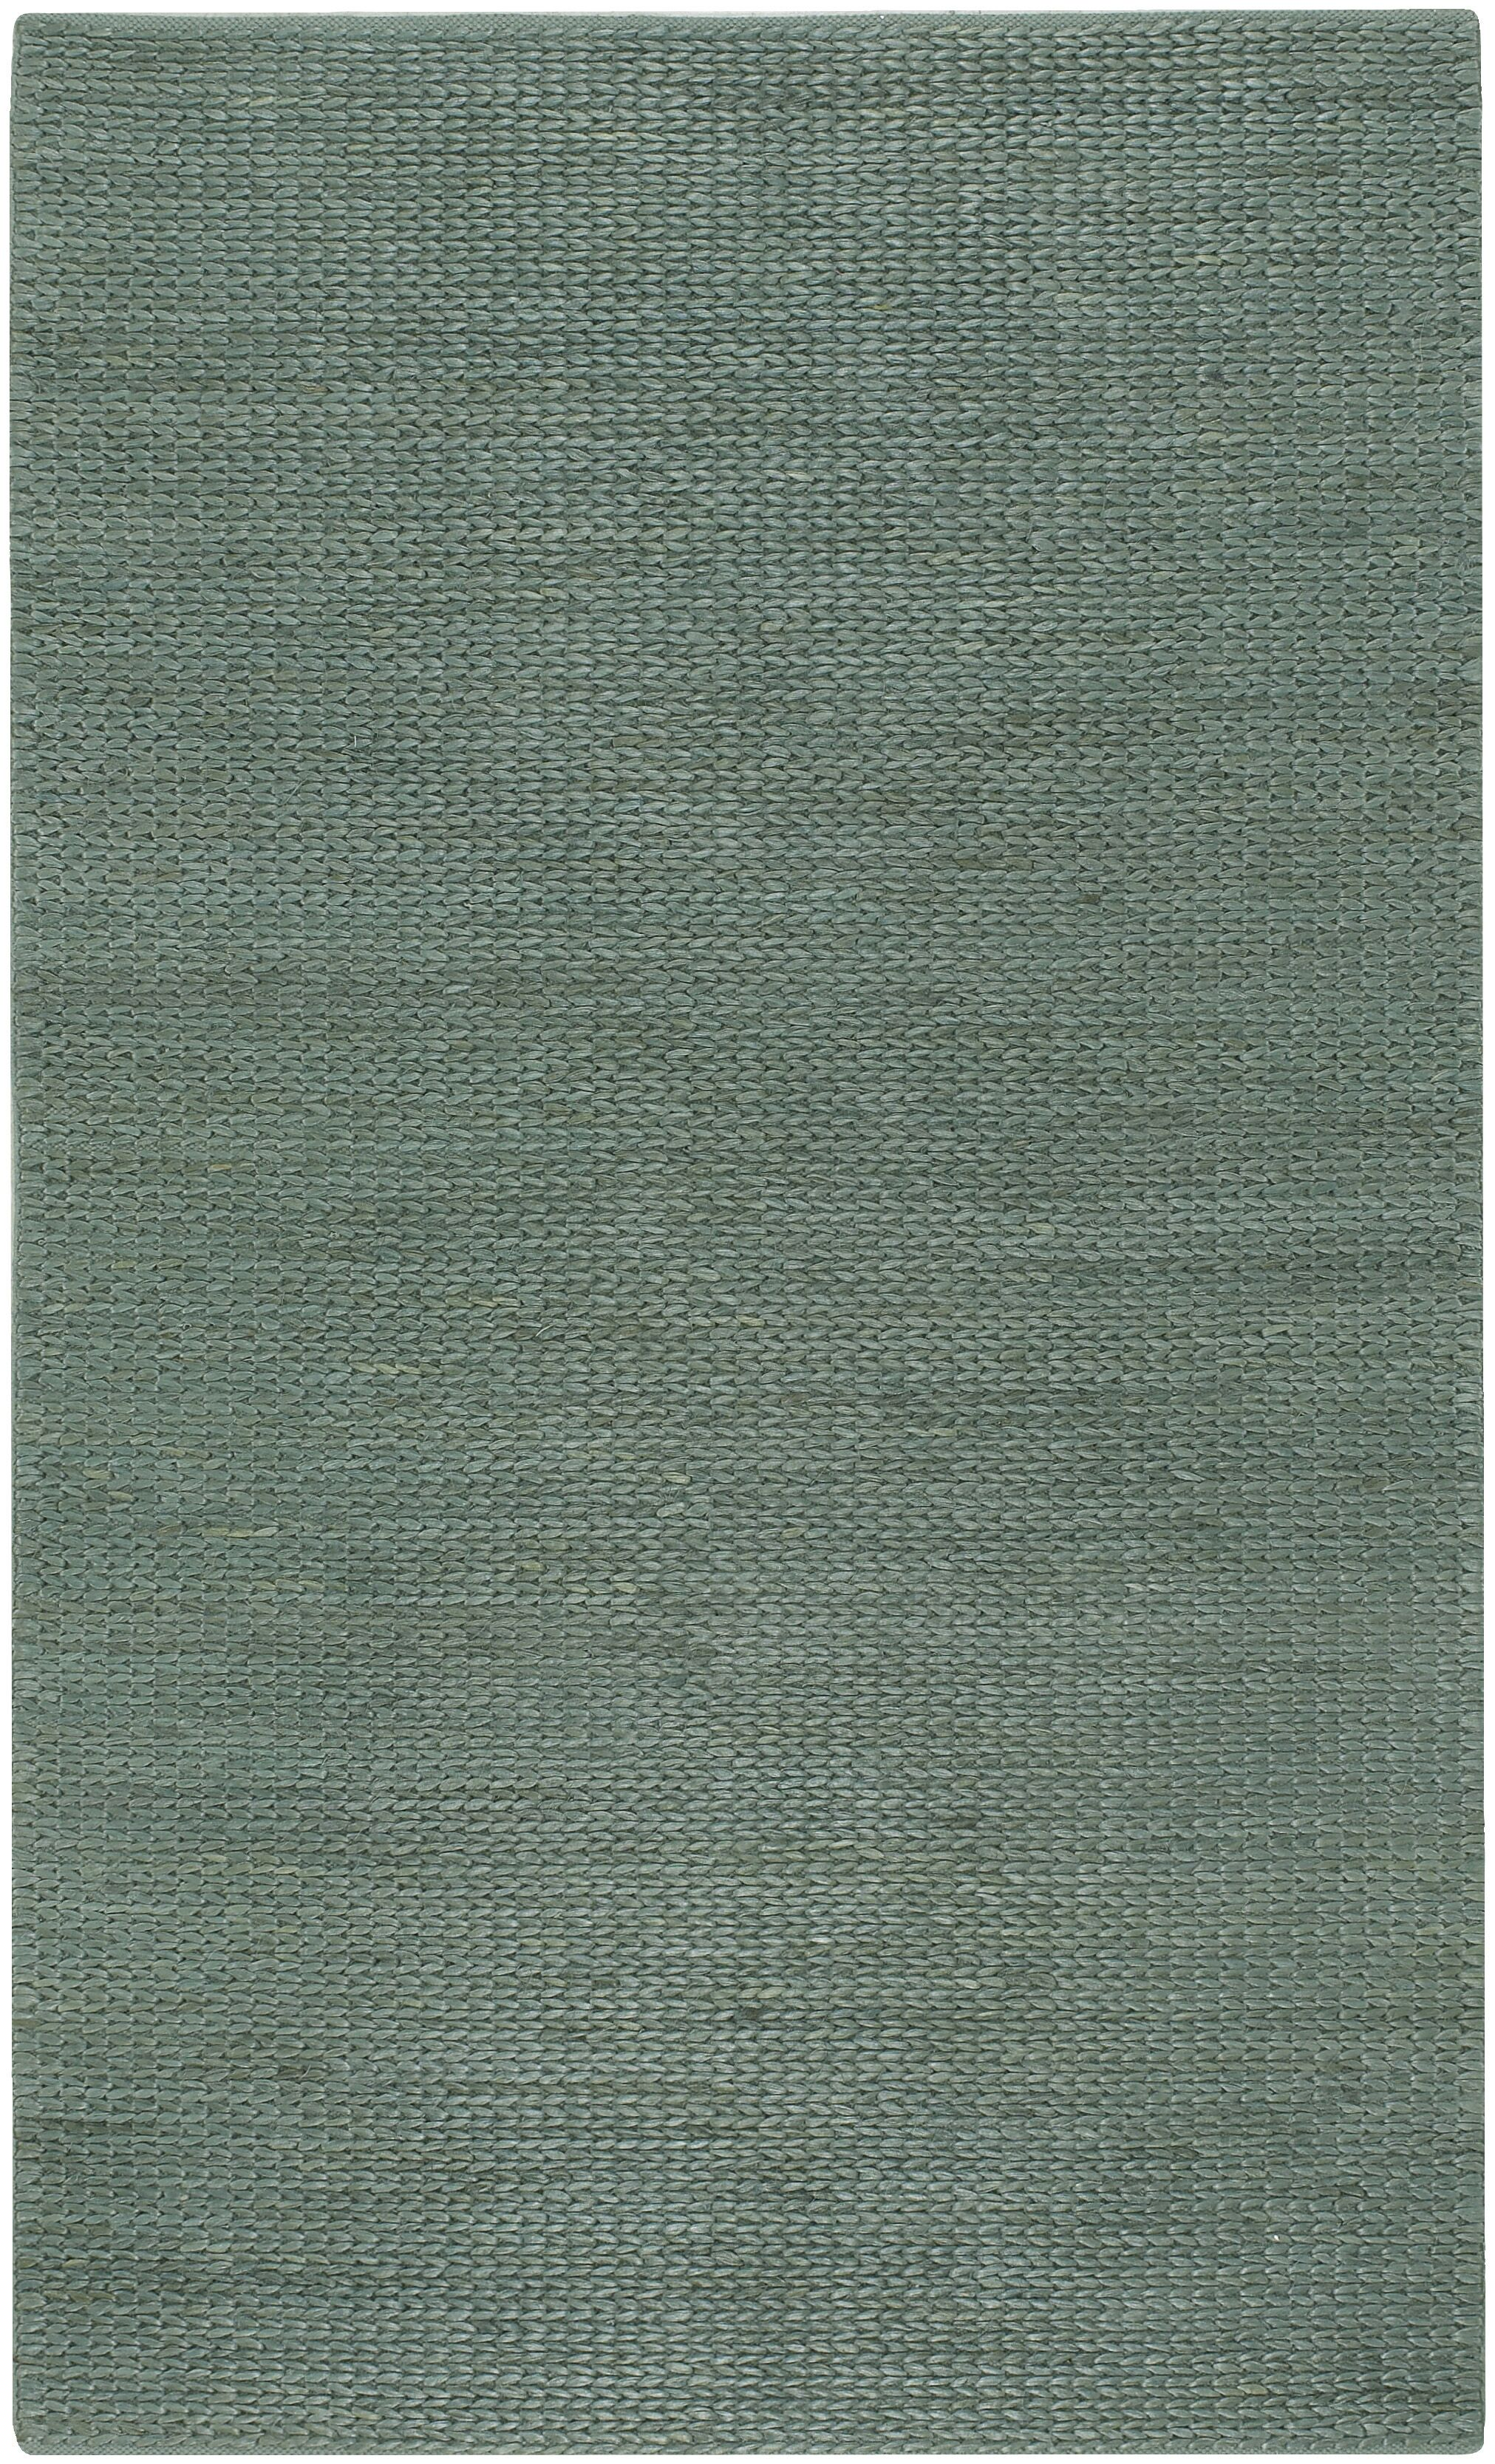 Tai Moss Area Rug Rug Size: Rectangle 8' x 11'